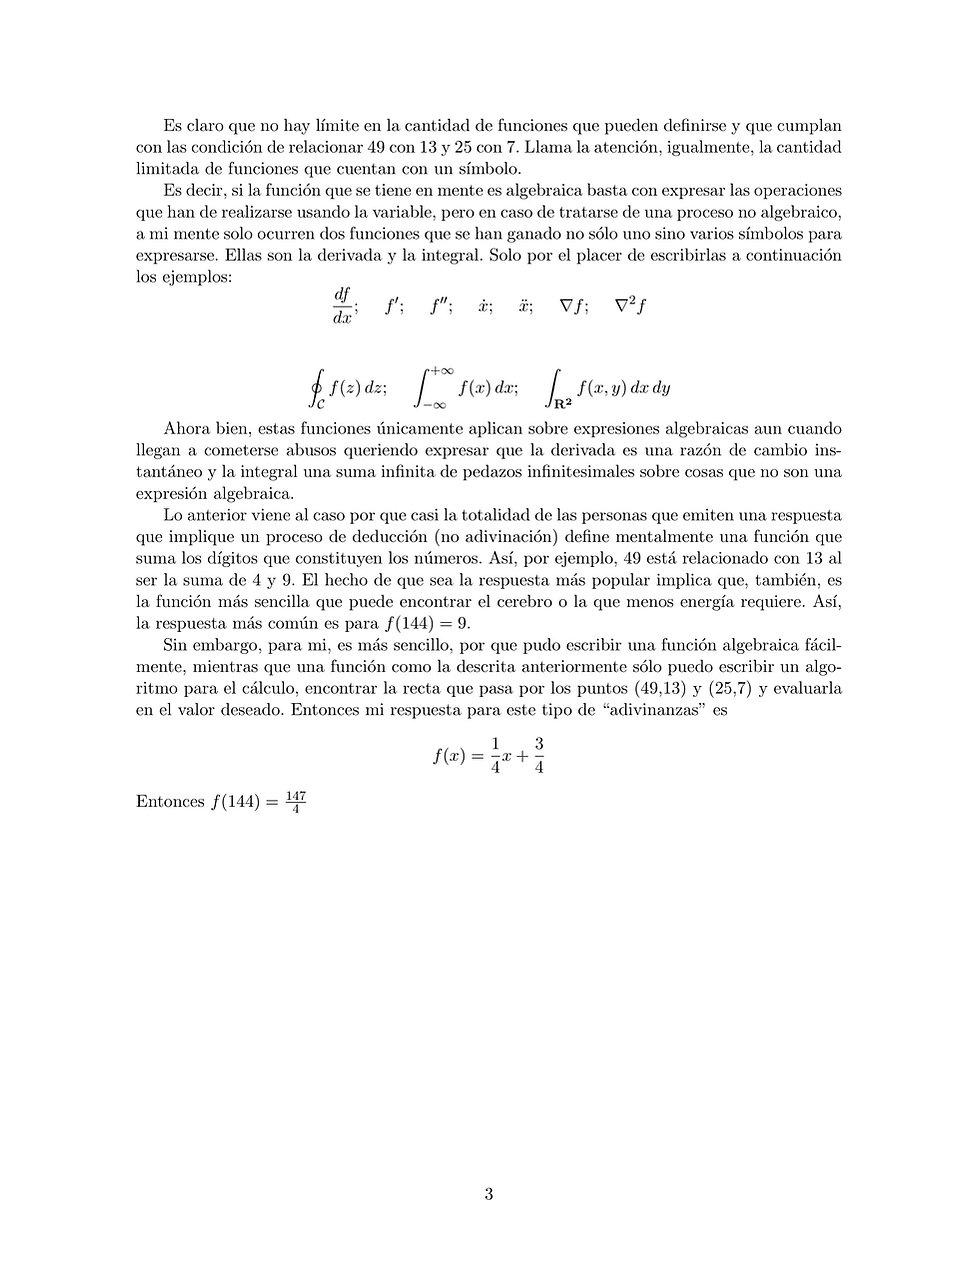 disertaciones-3.jpg